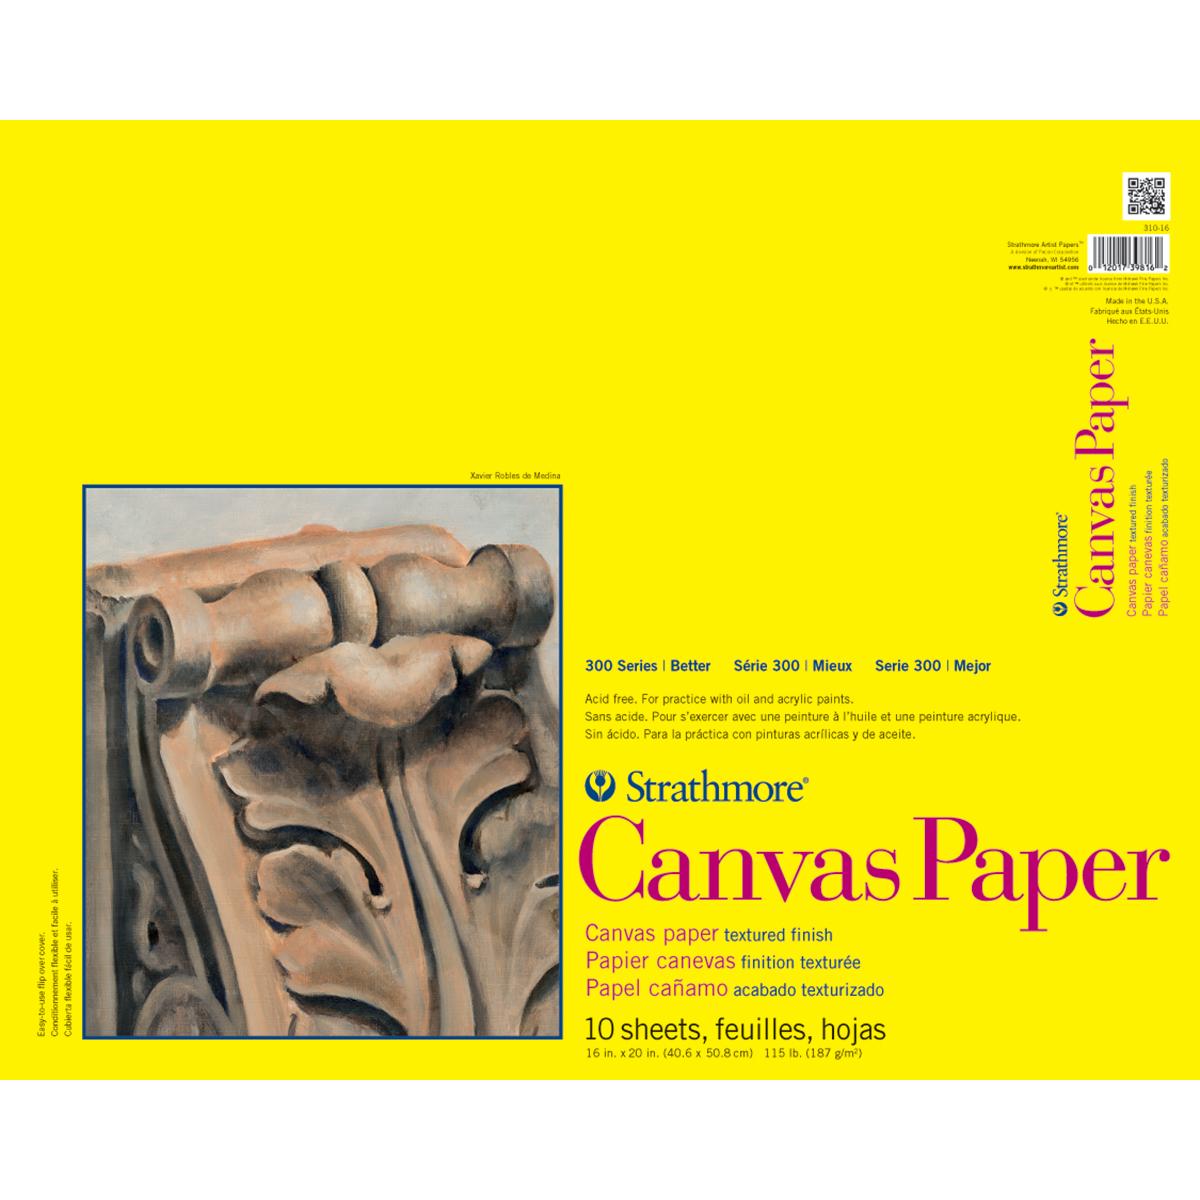 10 SHEETS -CANVAS PAPER PAD - CLEARANCE - NO FURTHER DISCOUNTS/NO RETURNS